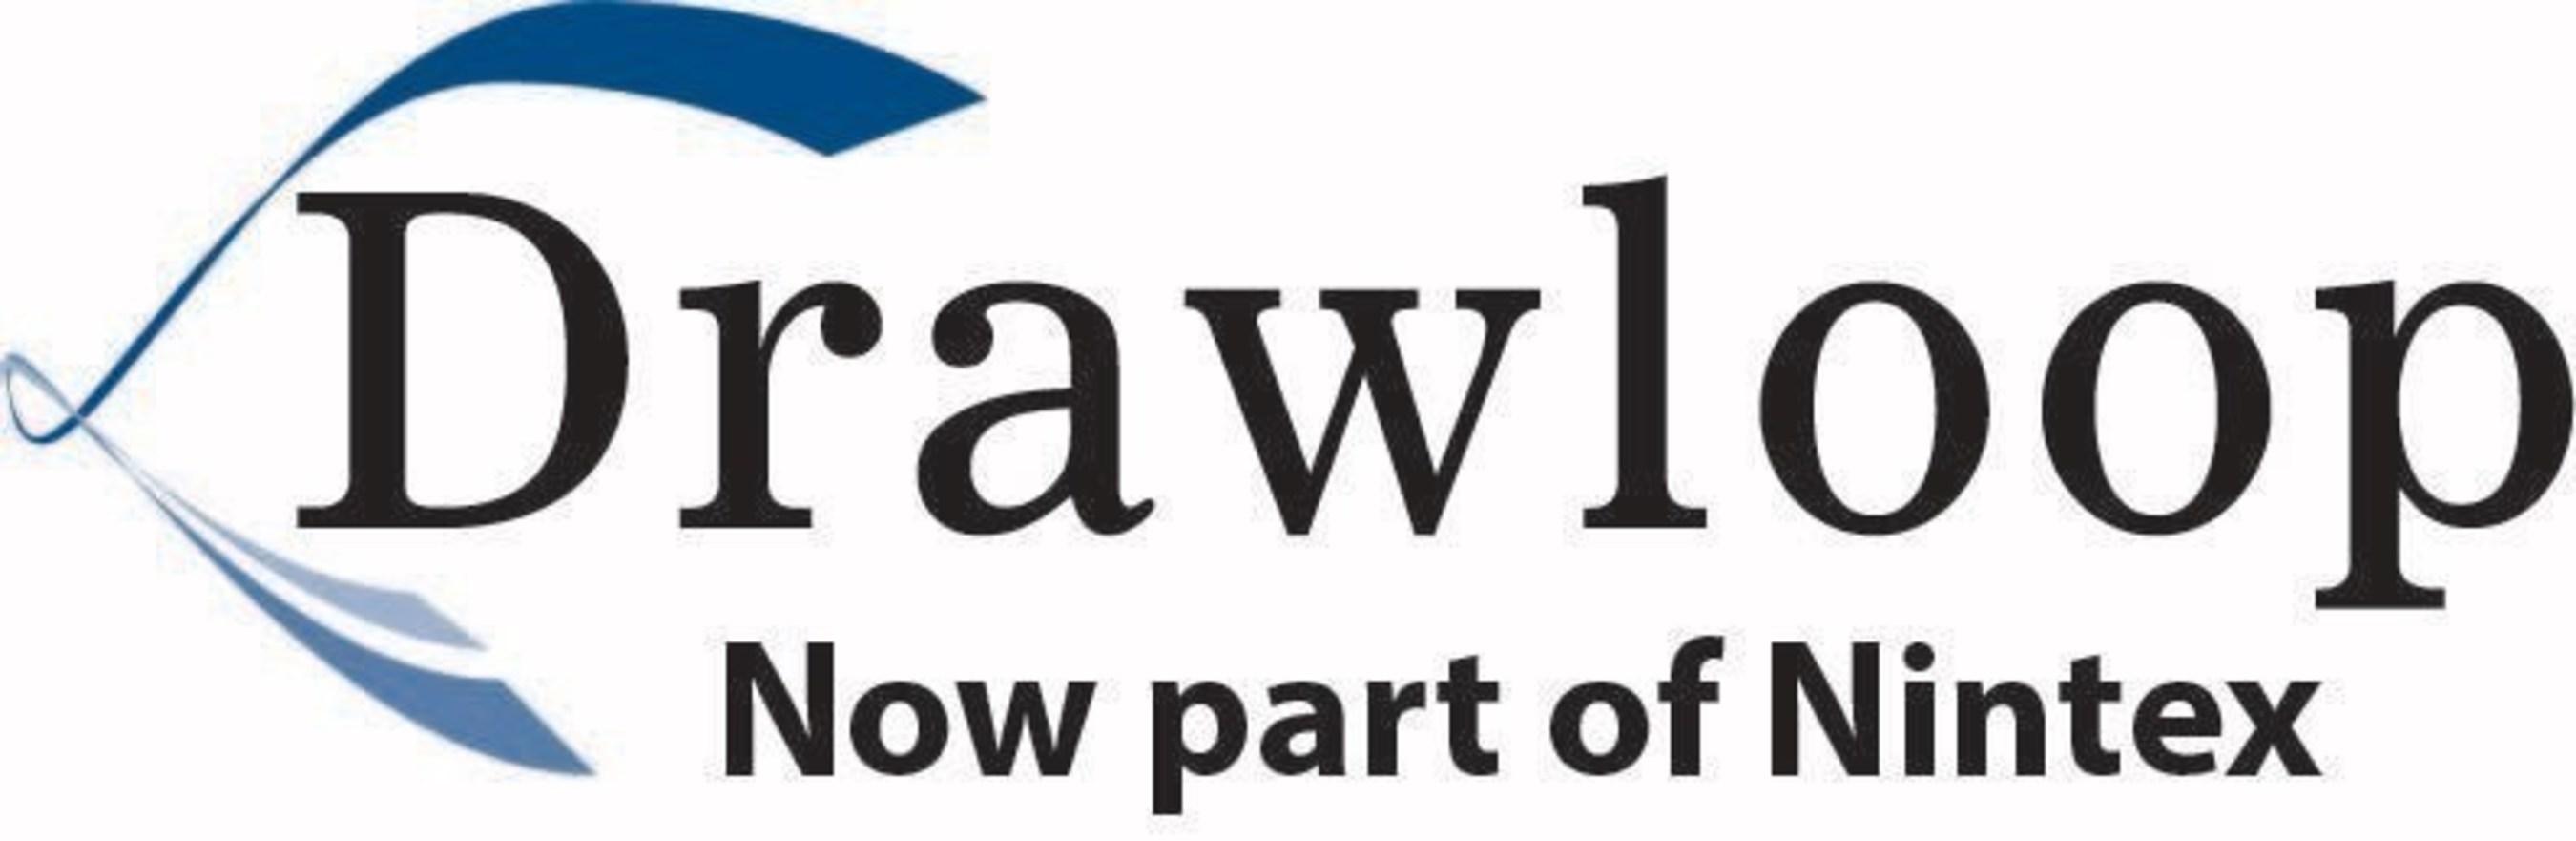 Nintex Acquires Drawloop Technologies, Inc.